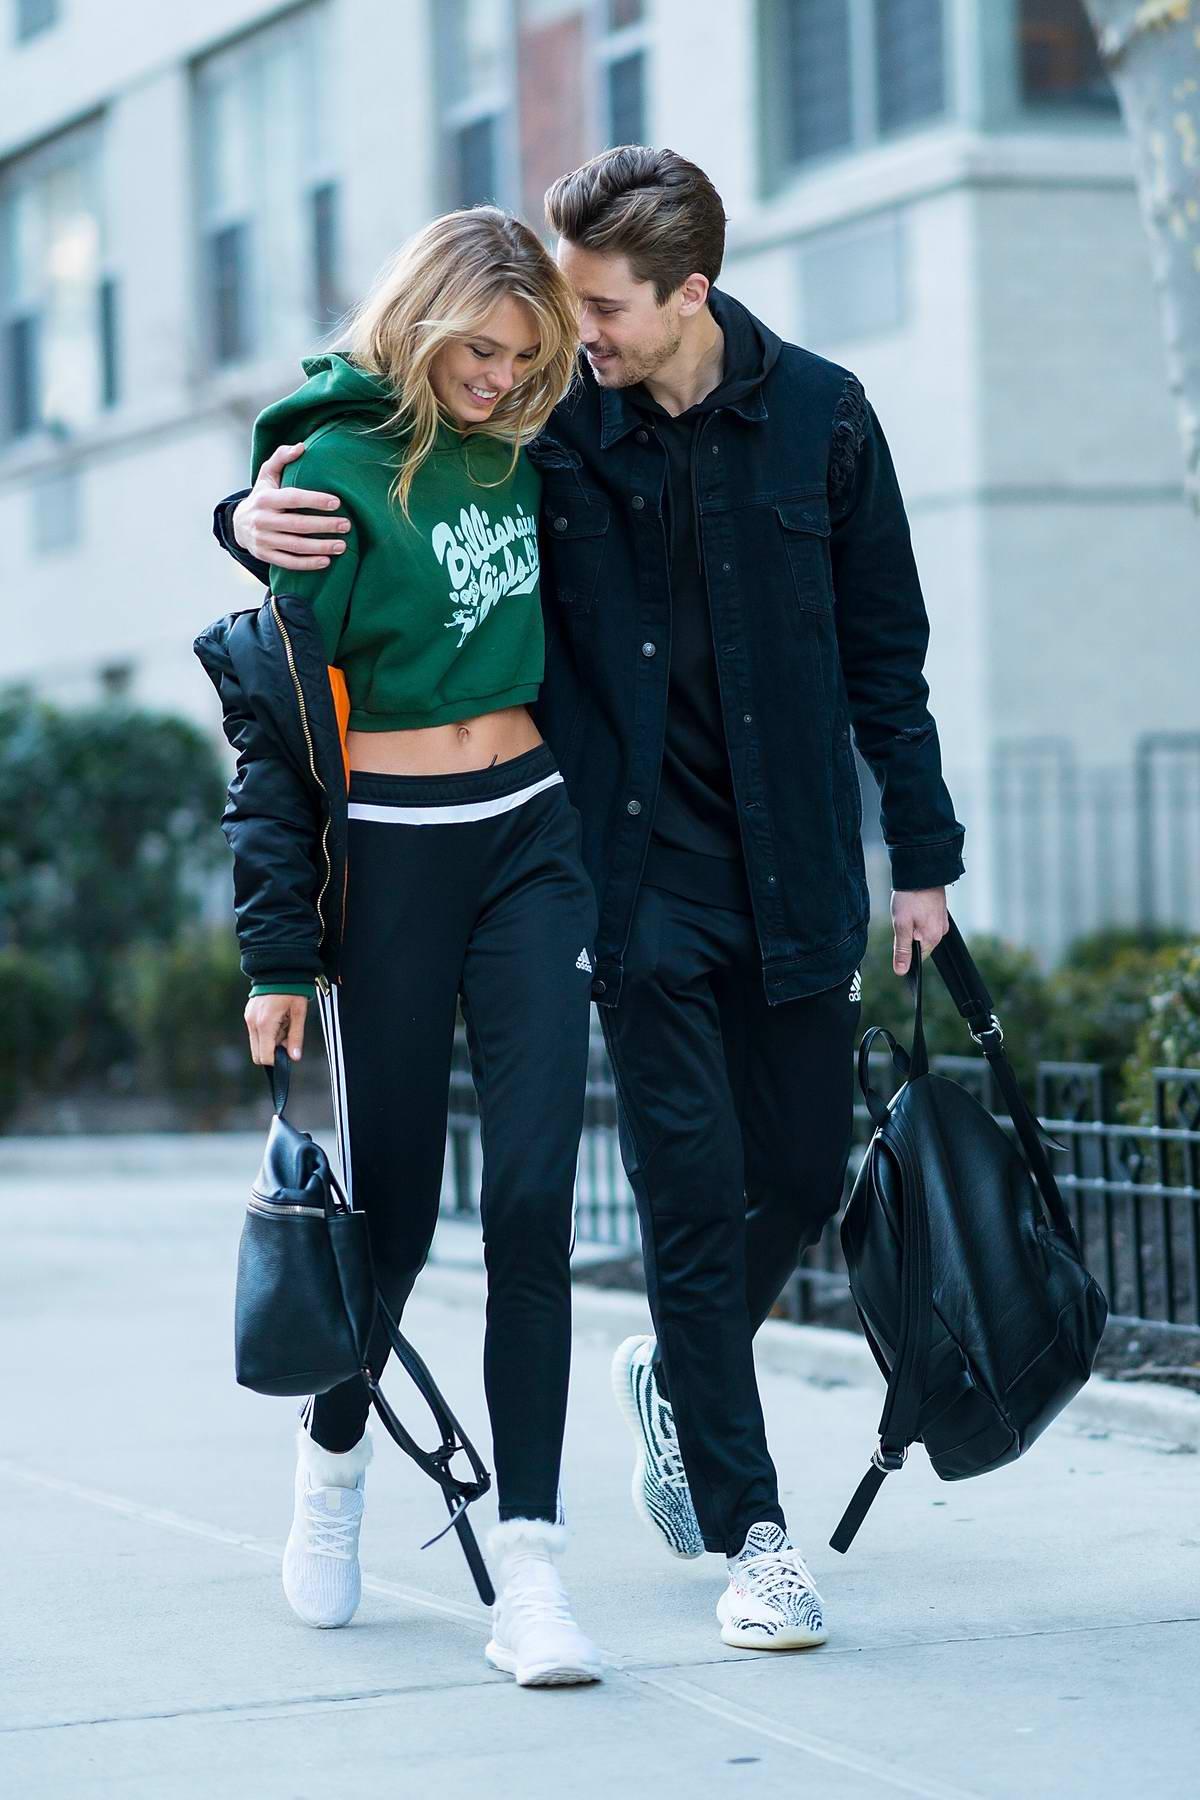 Romee Strijd out in Washington Square Park with boyfriend Laurens van Leeuwen in New York City